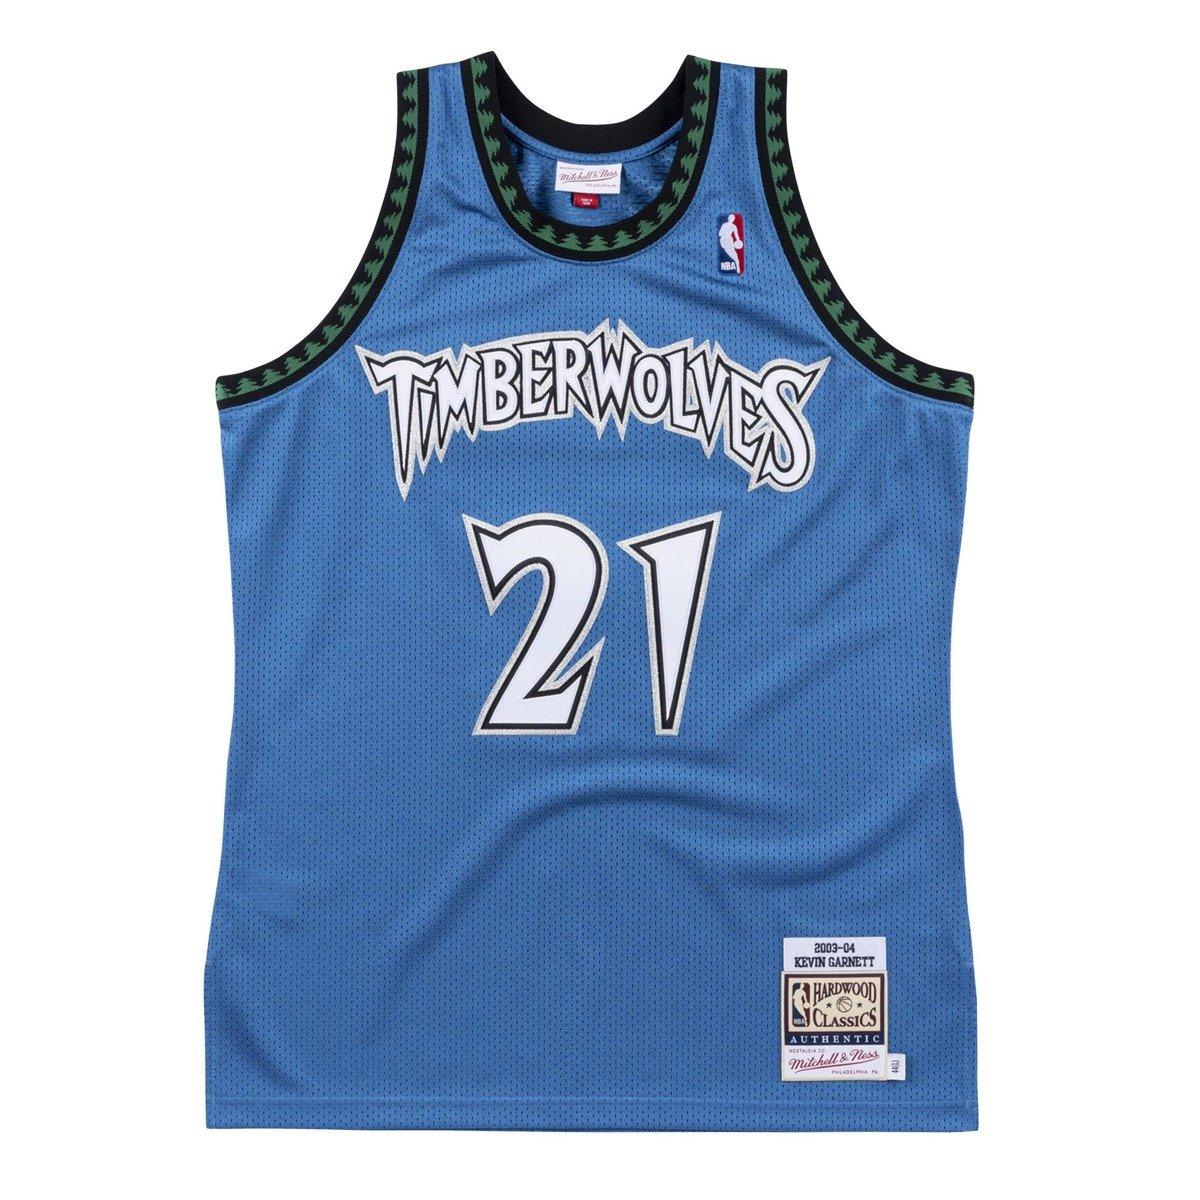 Mitchell Ness Nba Kevin Garnett Minnesota Timberwolves Authentic